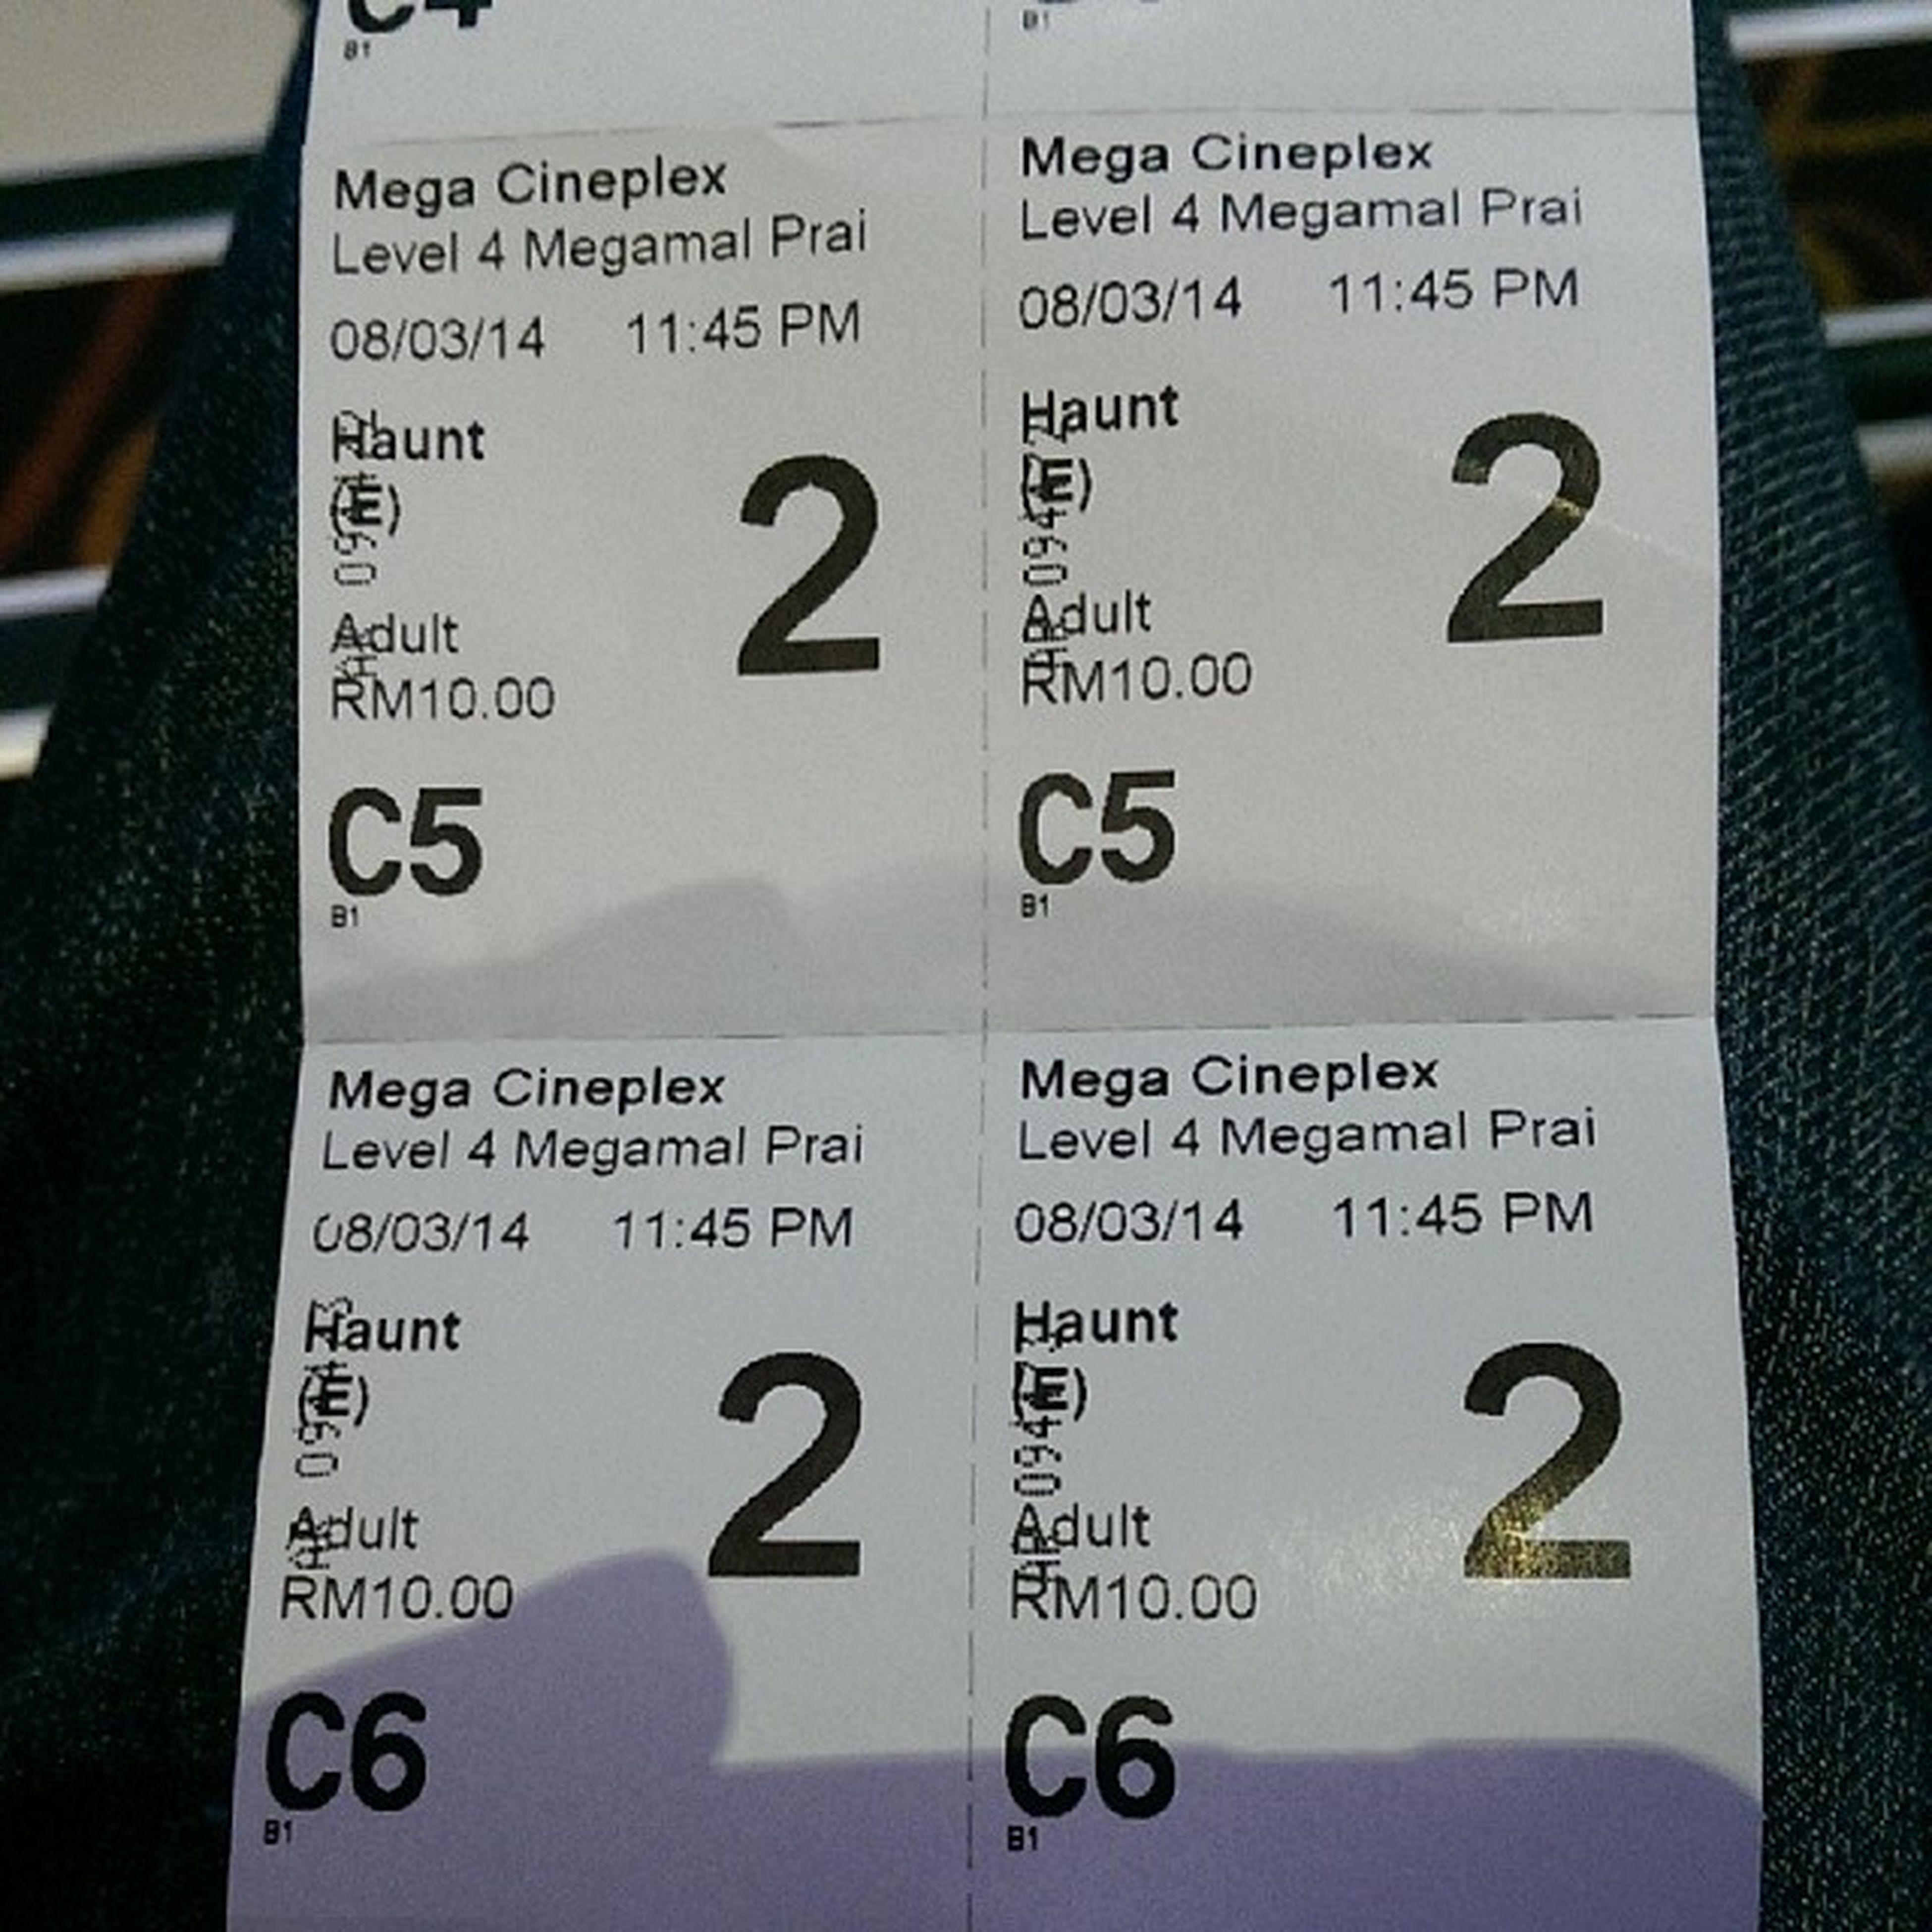 Layan Haunt MegaCineplex Megamall Prai penang